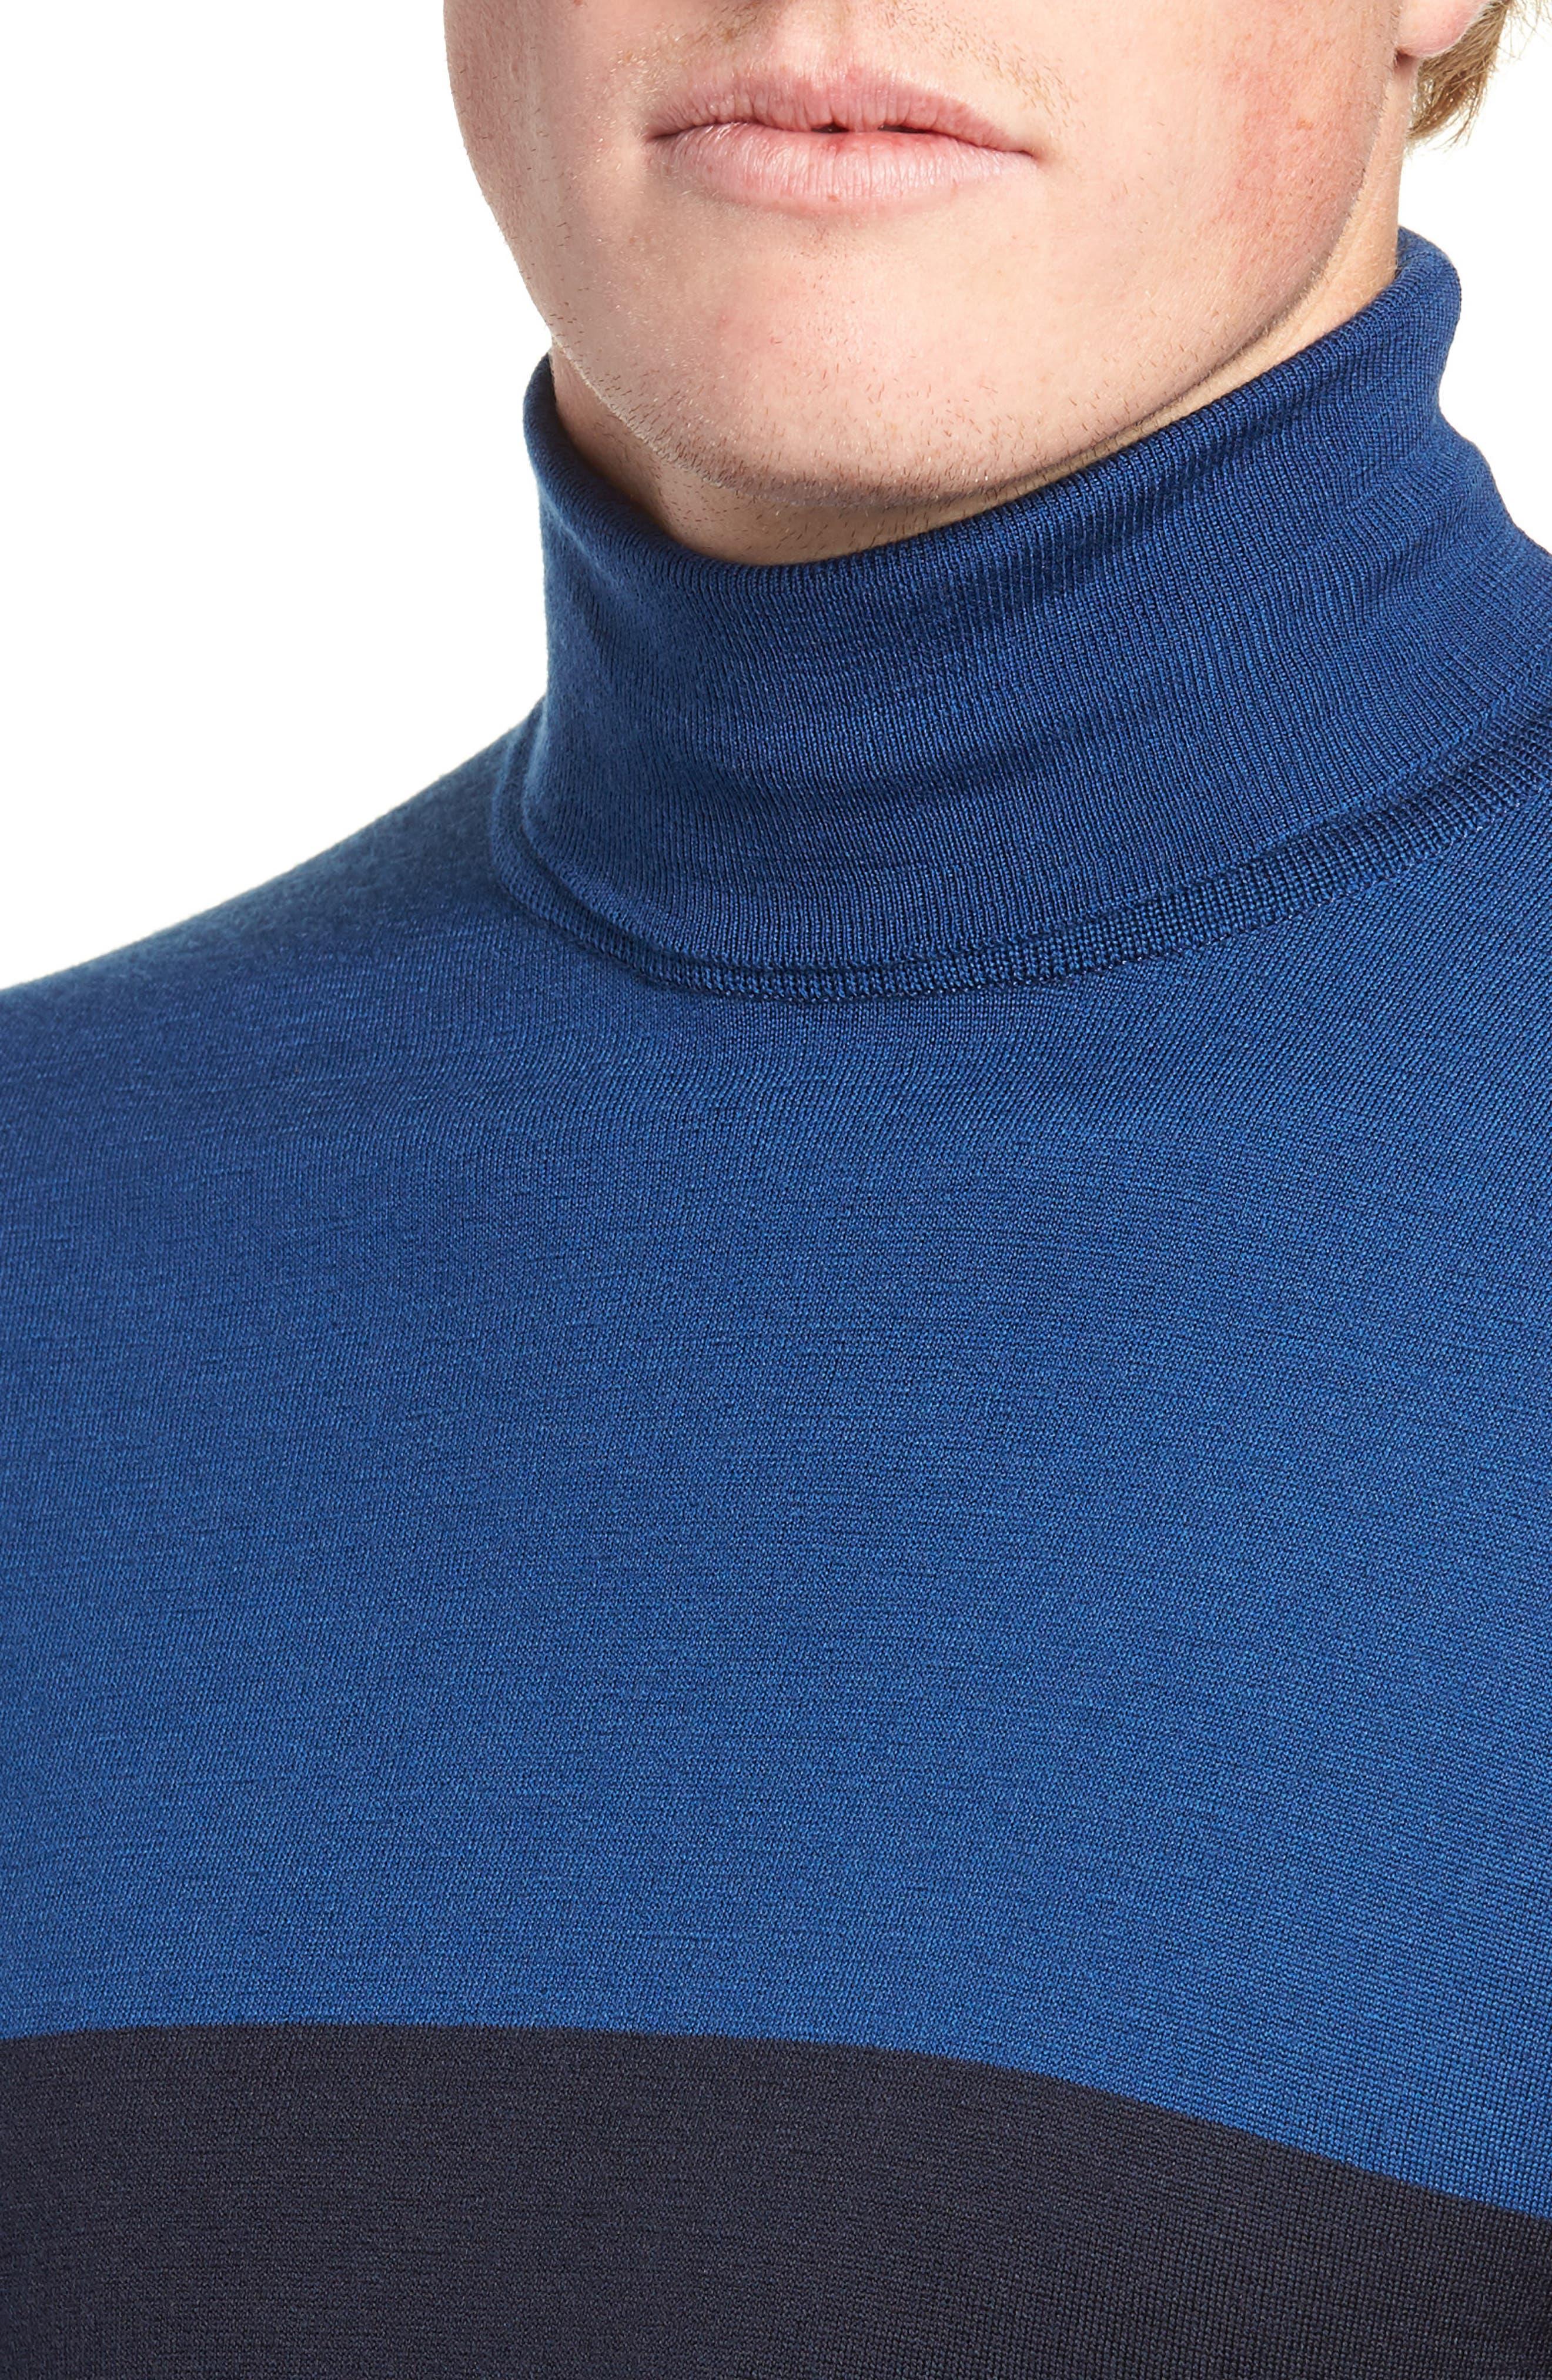 Slim Fit Colorblock Merino Wool Turtleneck Sweater,                             Alternate thumbnail 4, color,                             MIDNIGHT